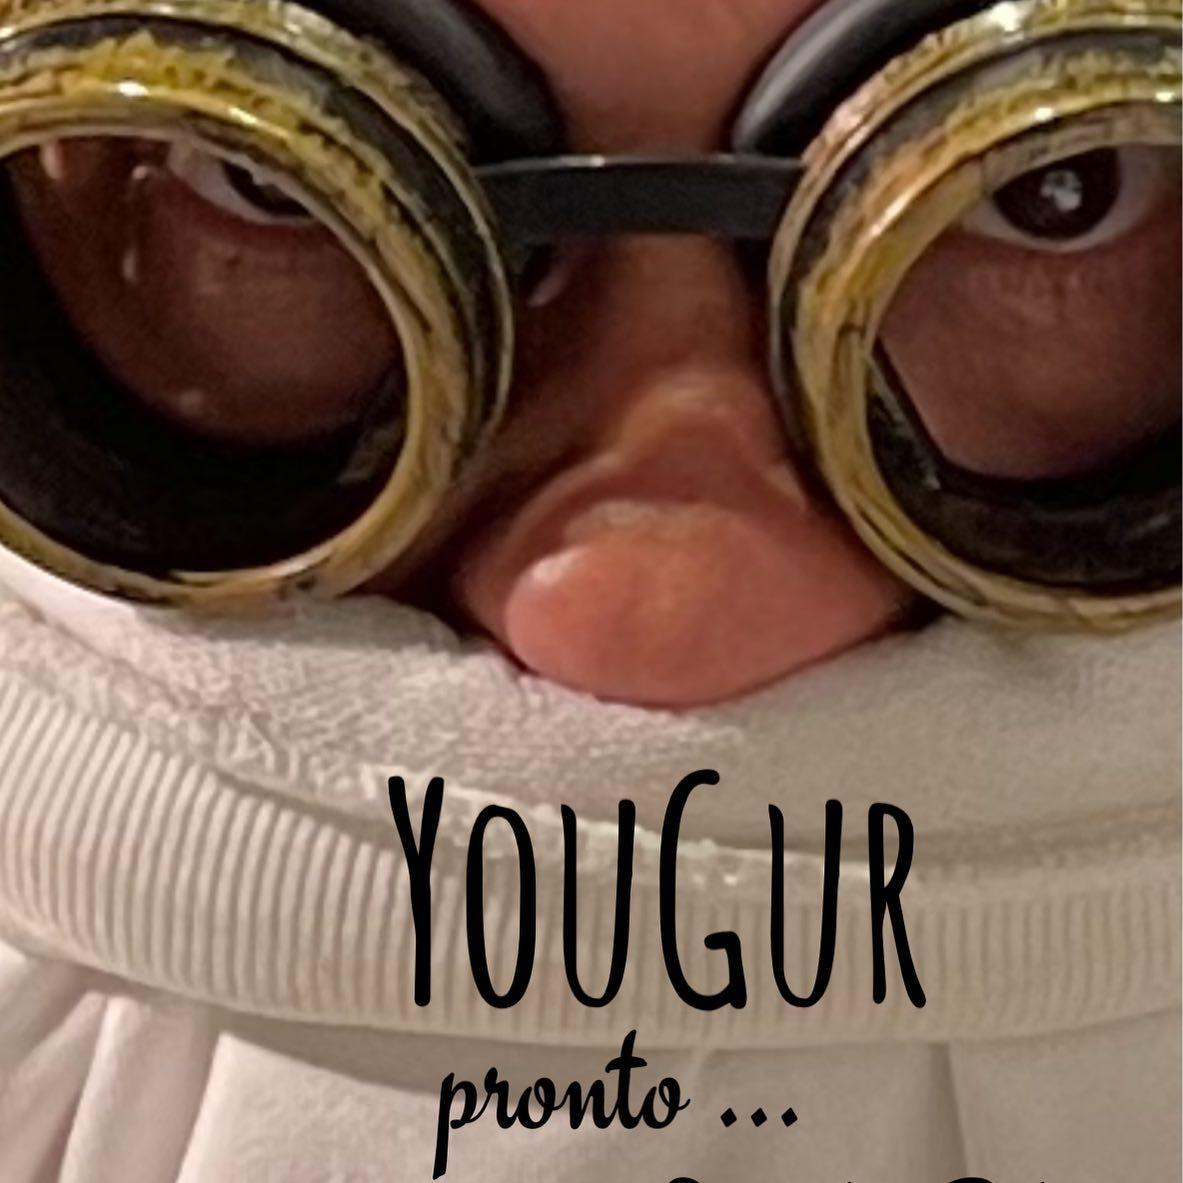 yougur